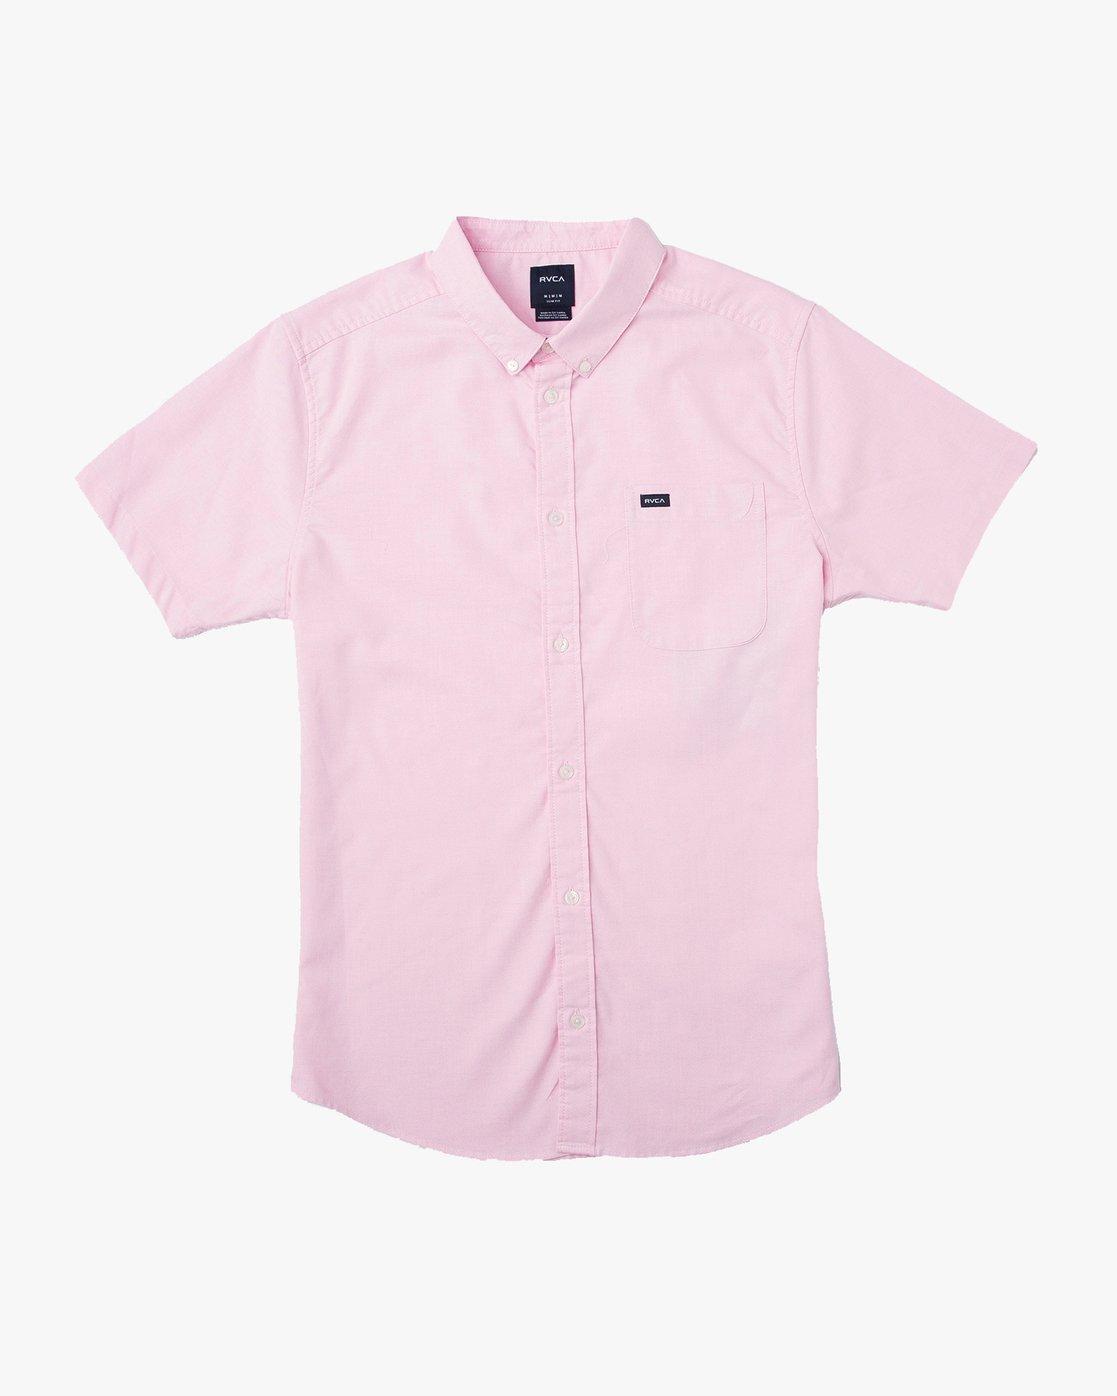 4 That'll Do Stretch Short Sleeve Shirt Pink MK515TDS RVCA